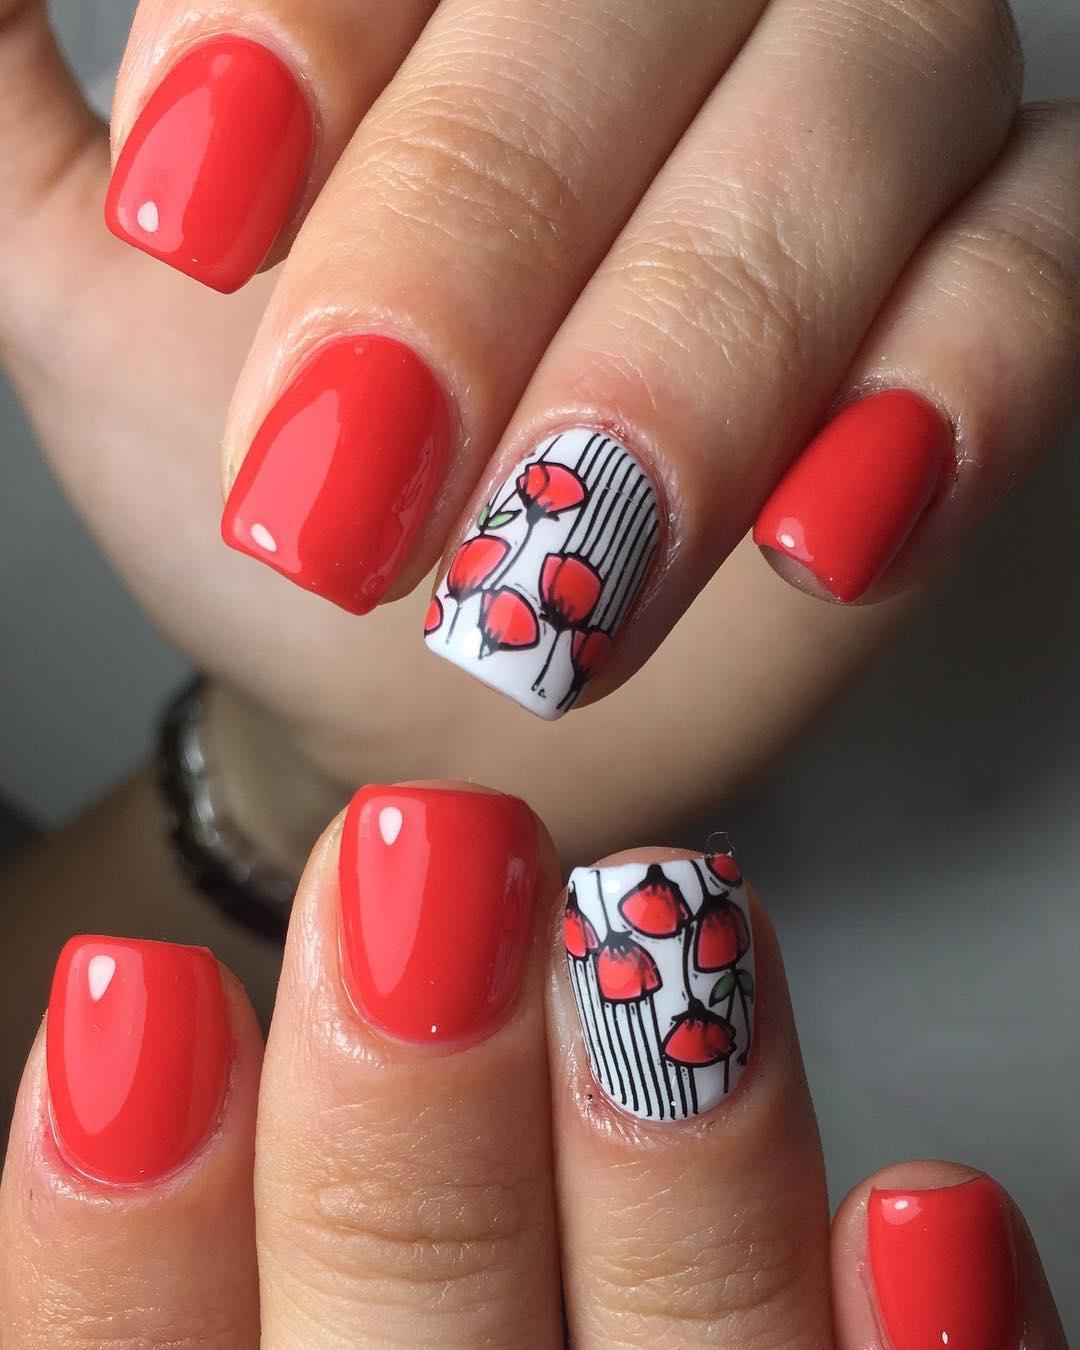 45+ Gel Nail Design Ideas For Summer - Blurmark